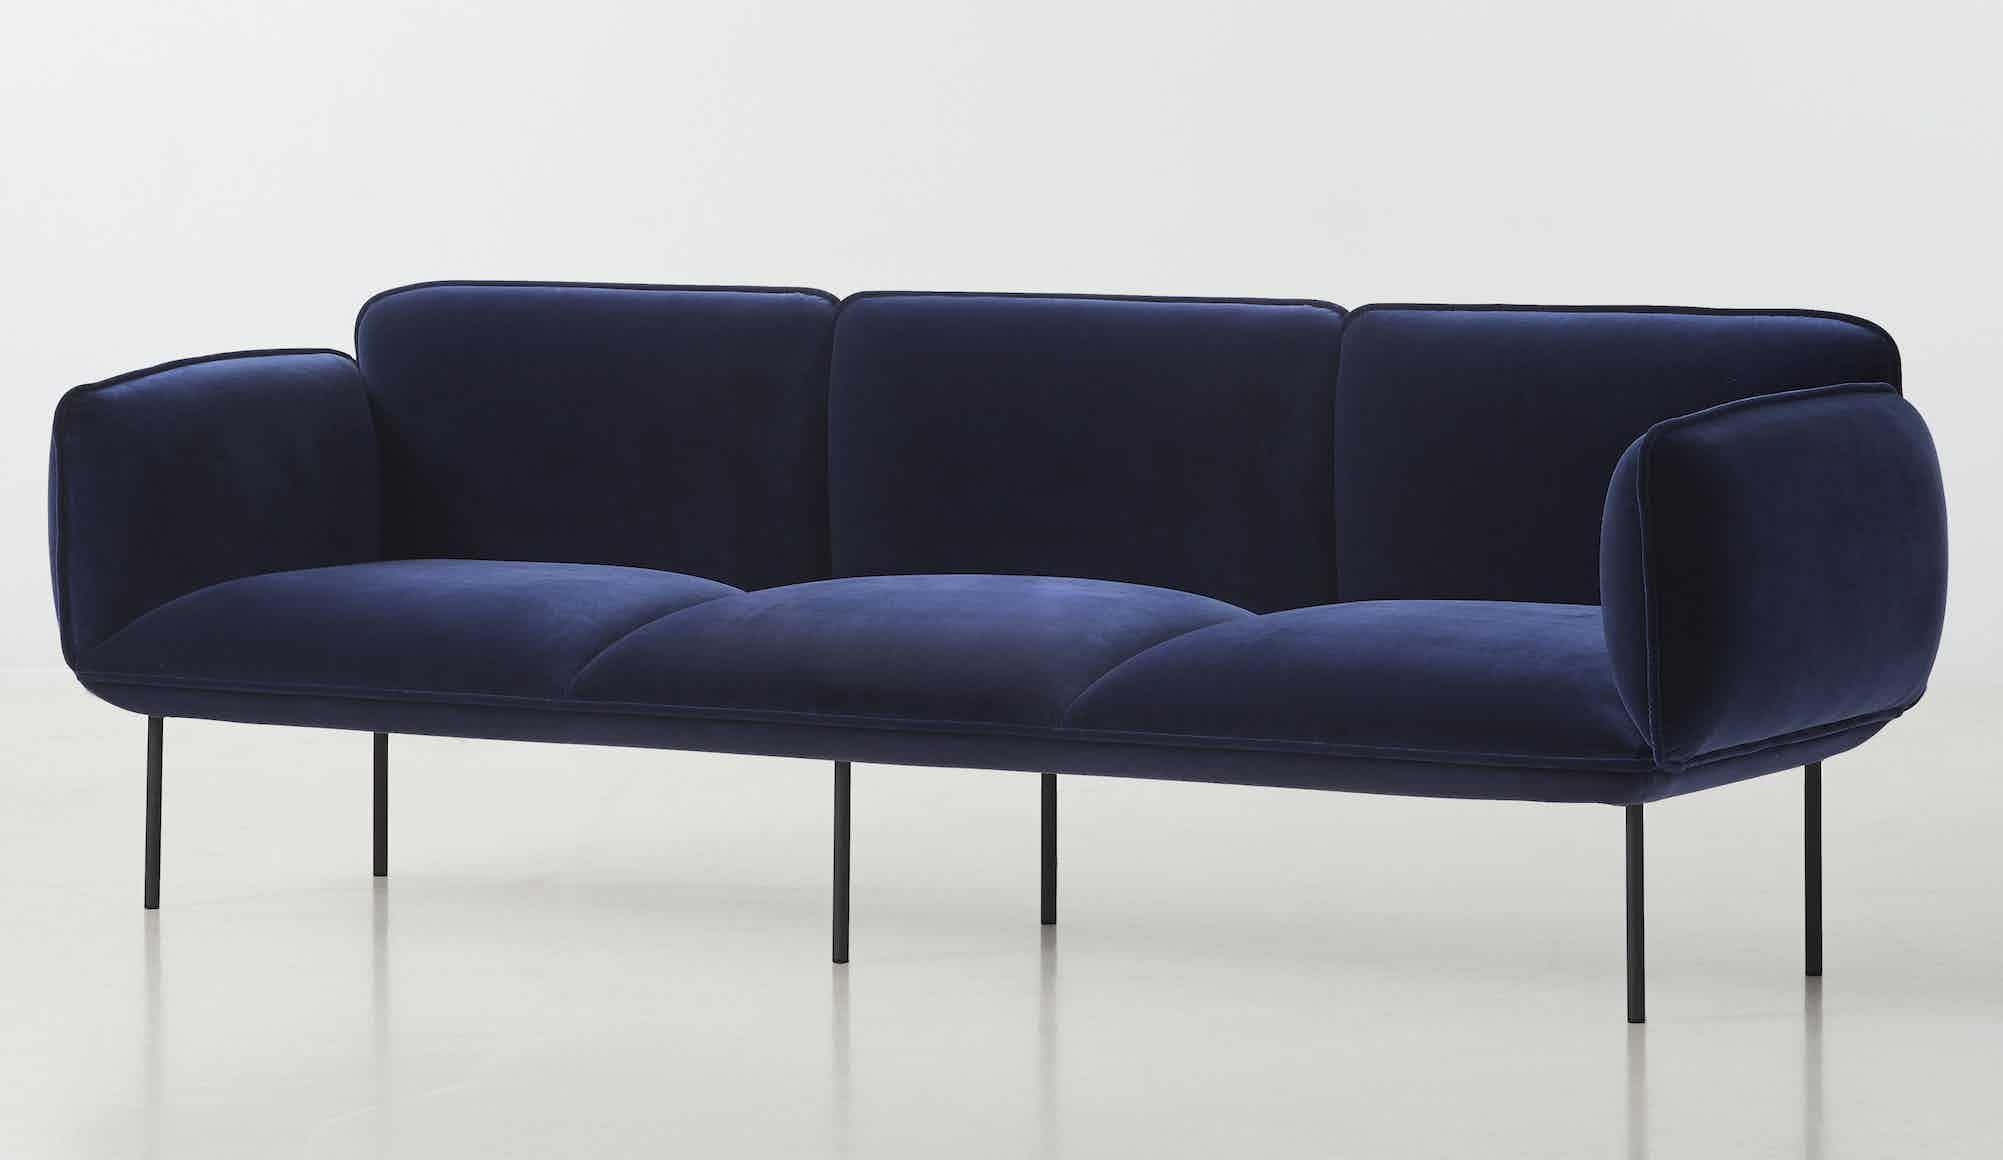 Woud furniture nakki 3 seater thumbnail haute living